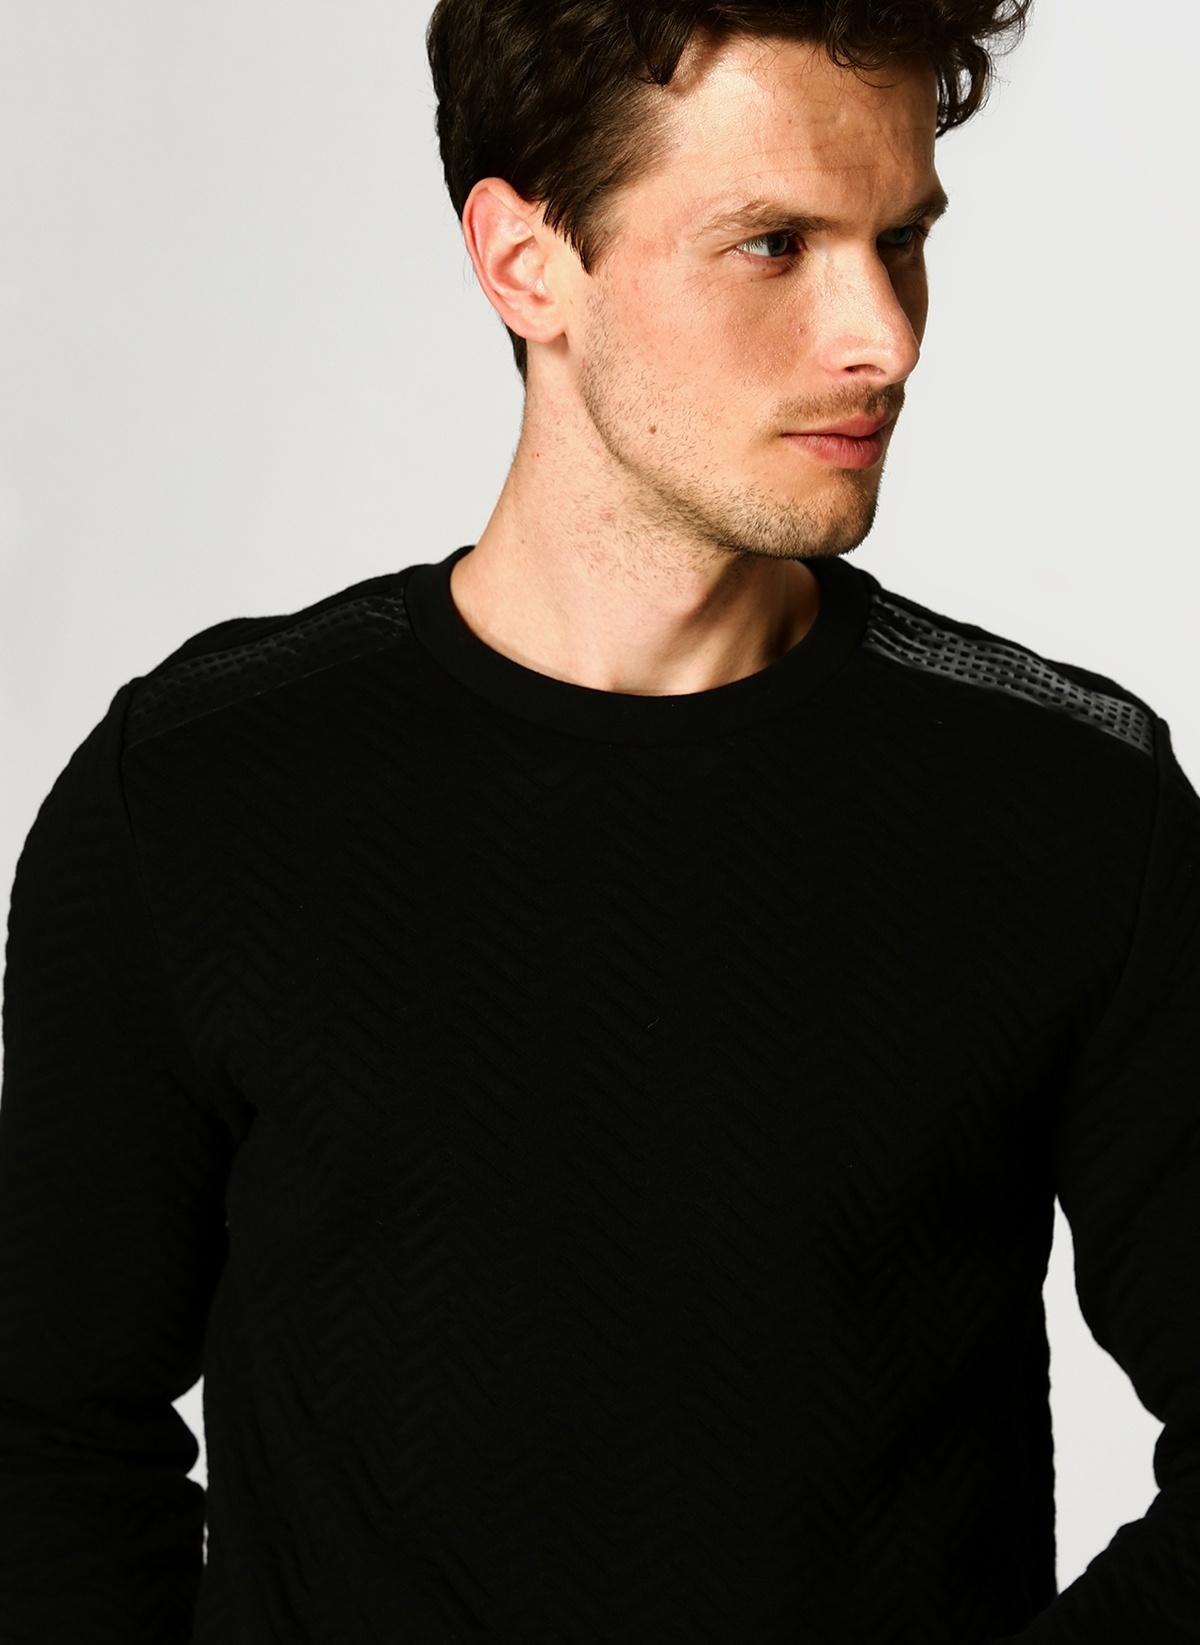 Fabrika Sweatshirt 28-ad14-a7-r3-5 Fabrika Sweatshırt – 79.99 TL